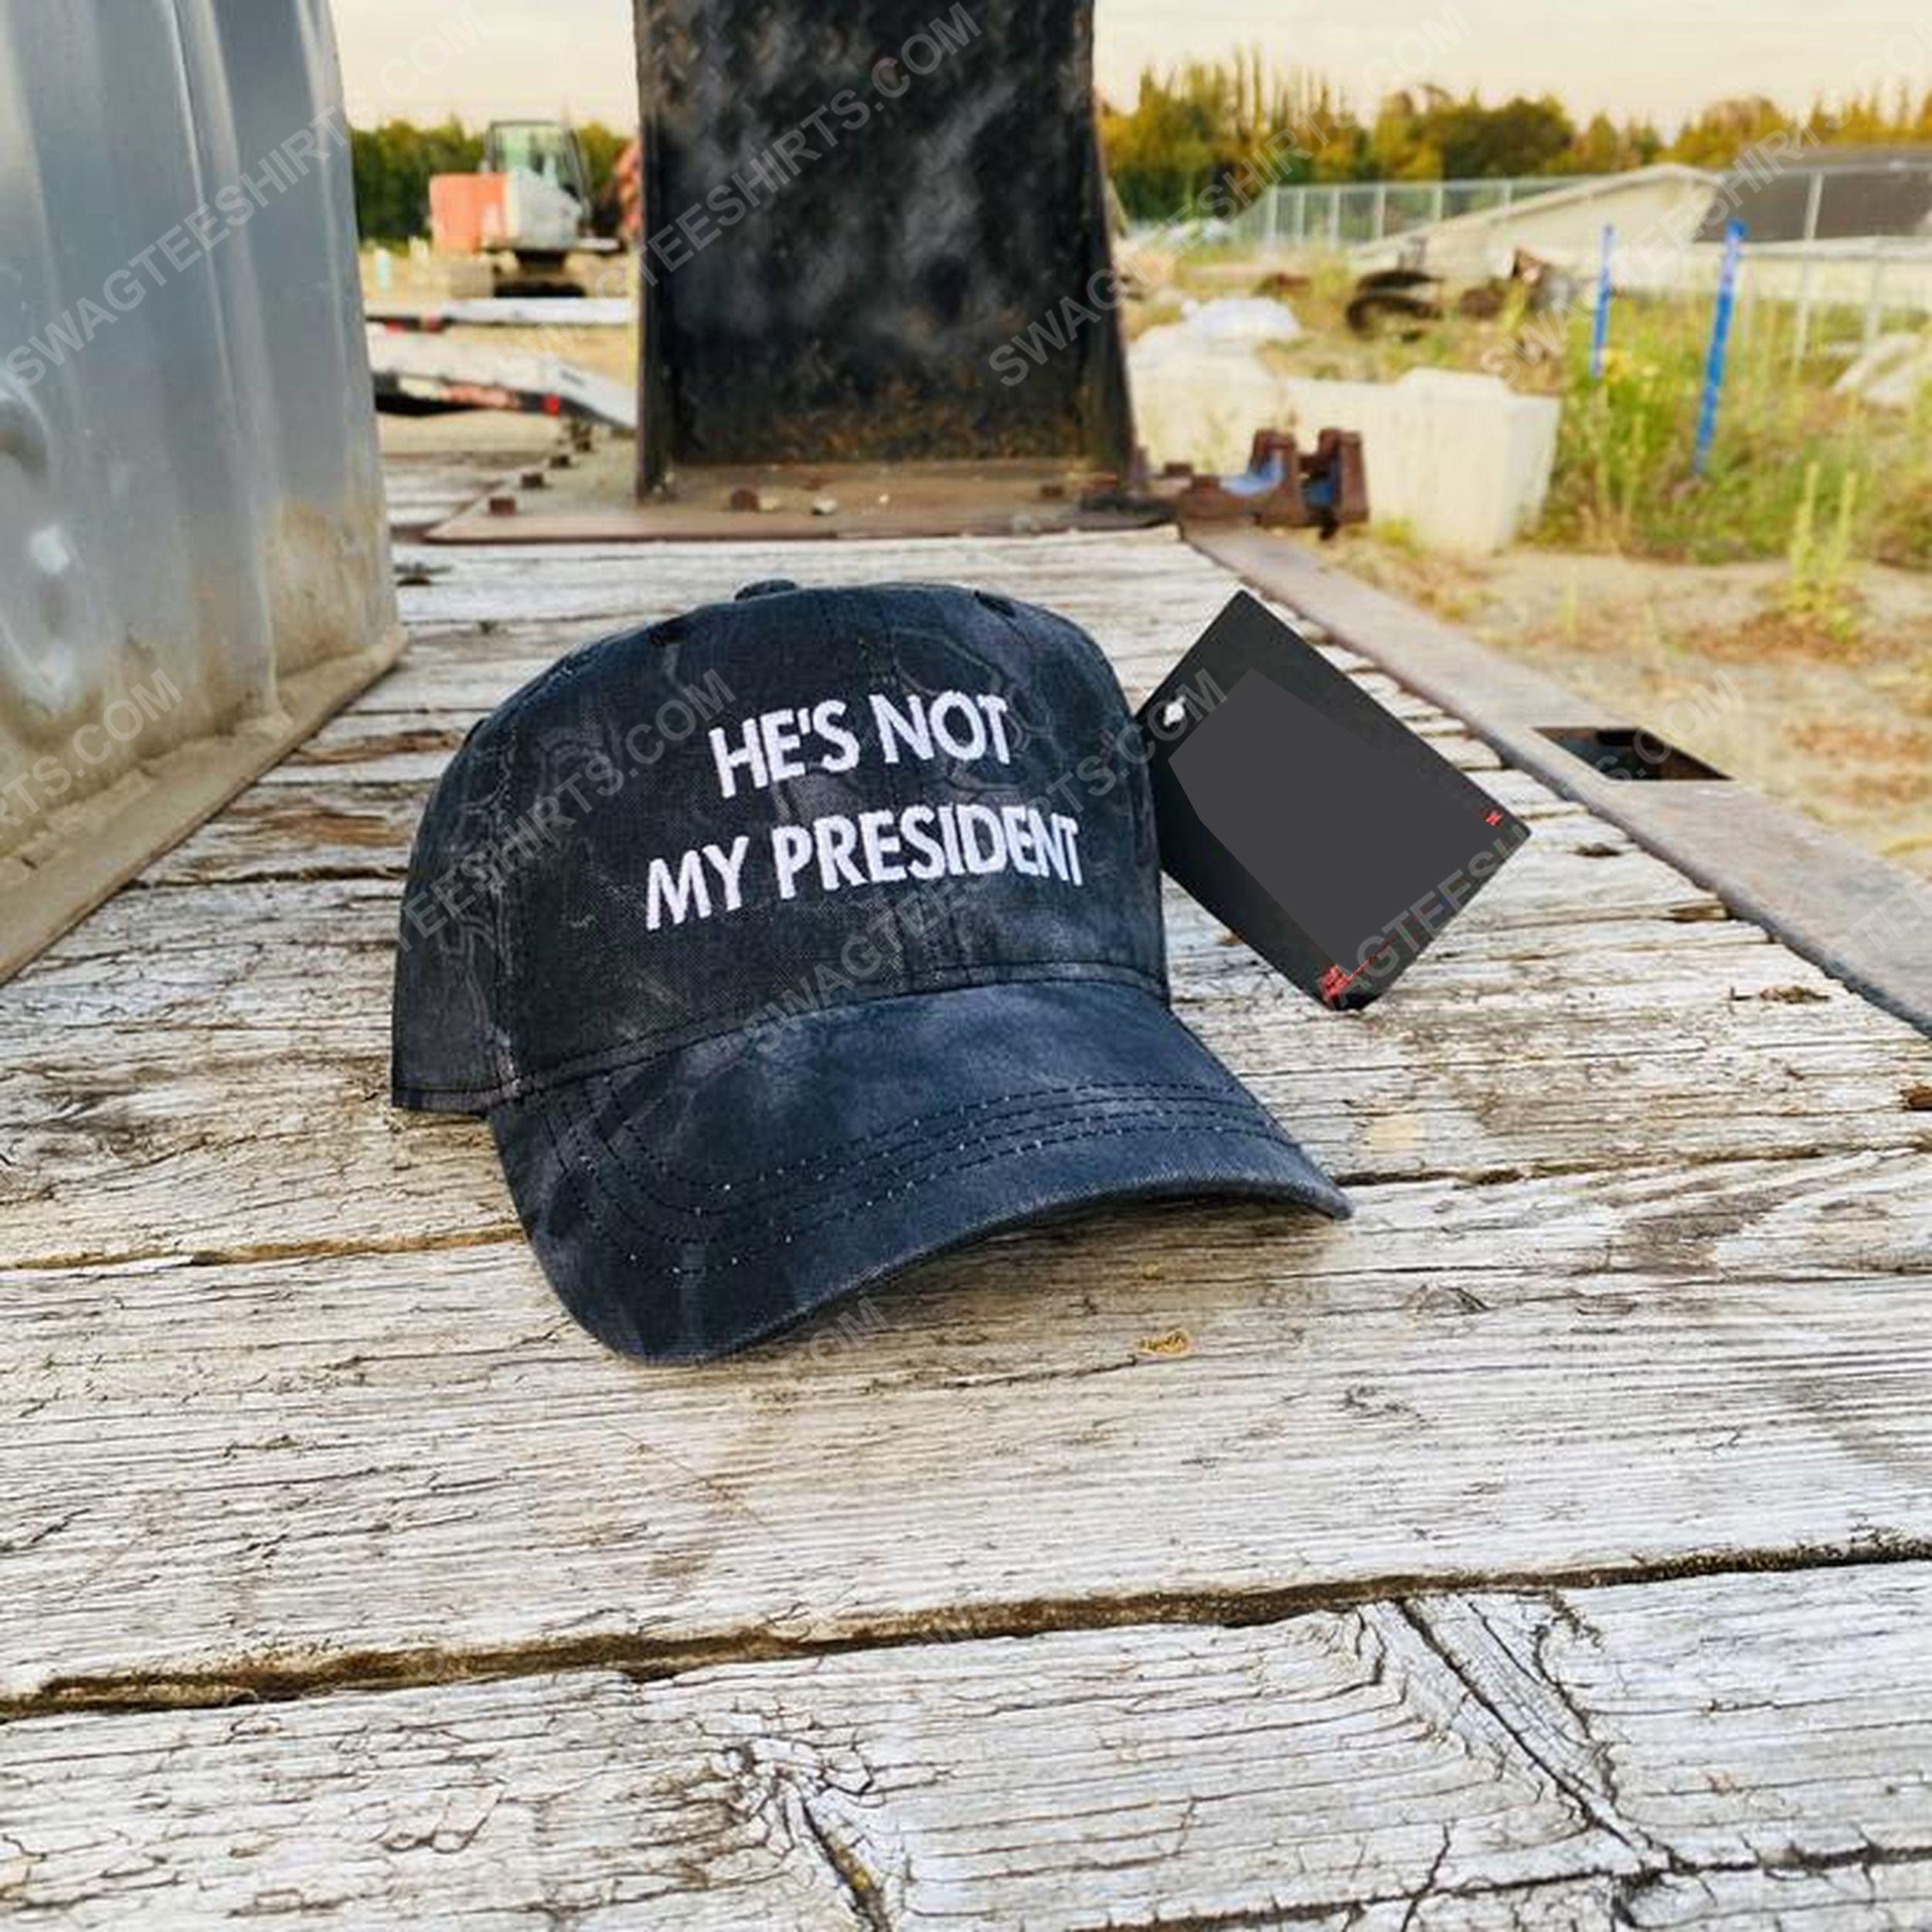 He's not my president full print classic hat 1 - Copy